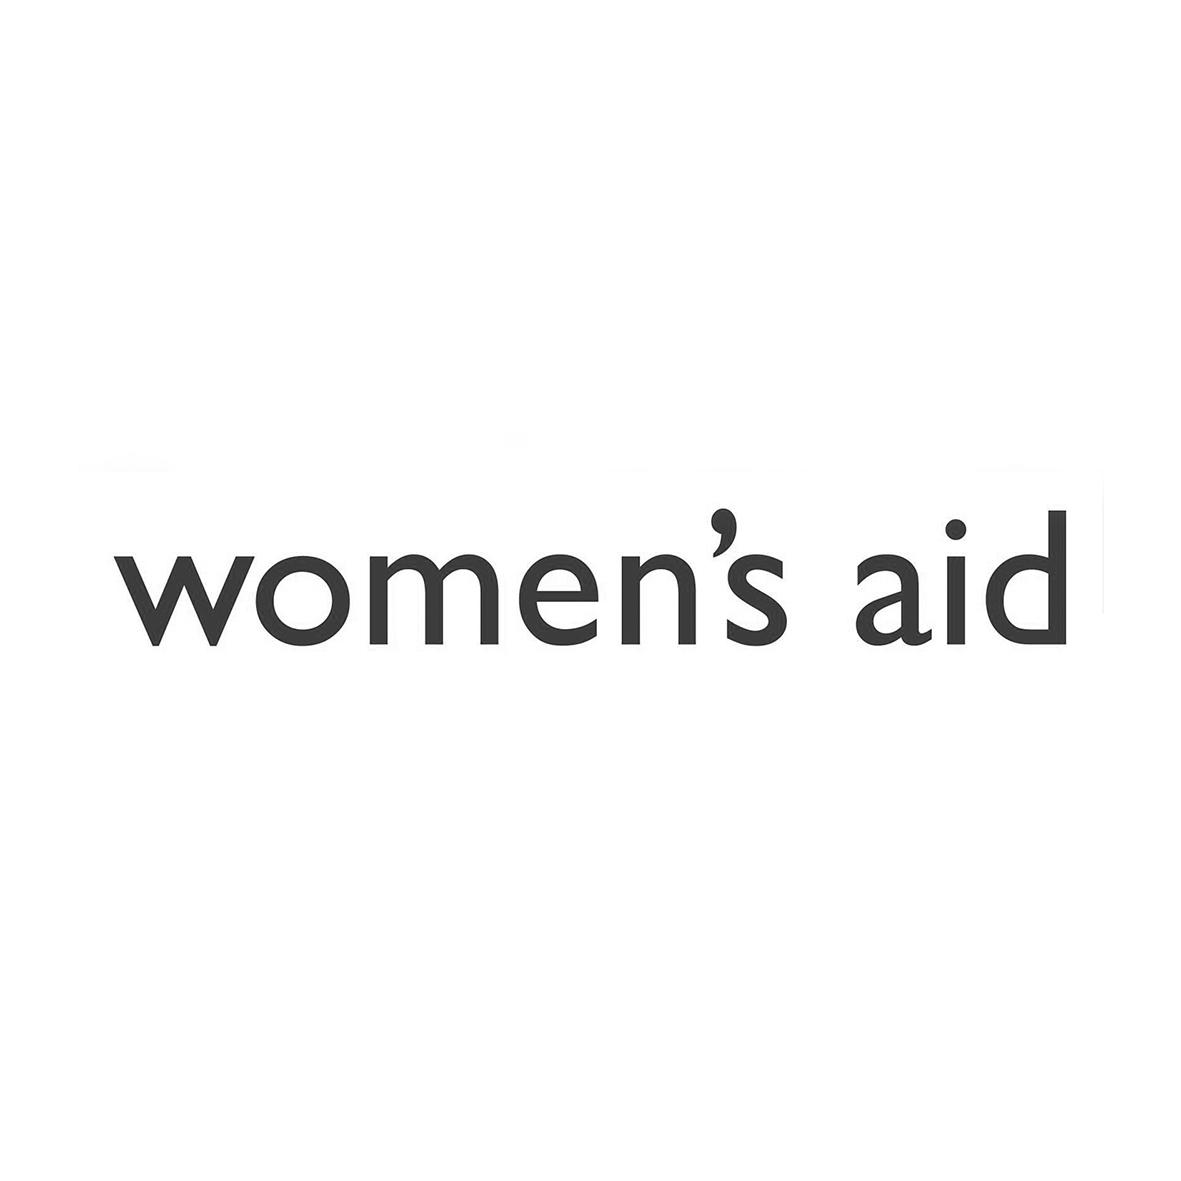 womensaid-bw.jpg